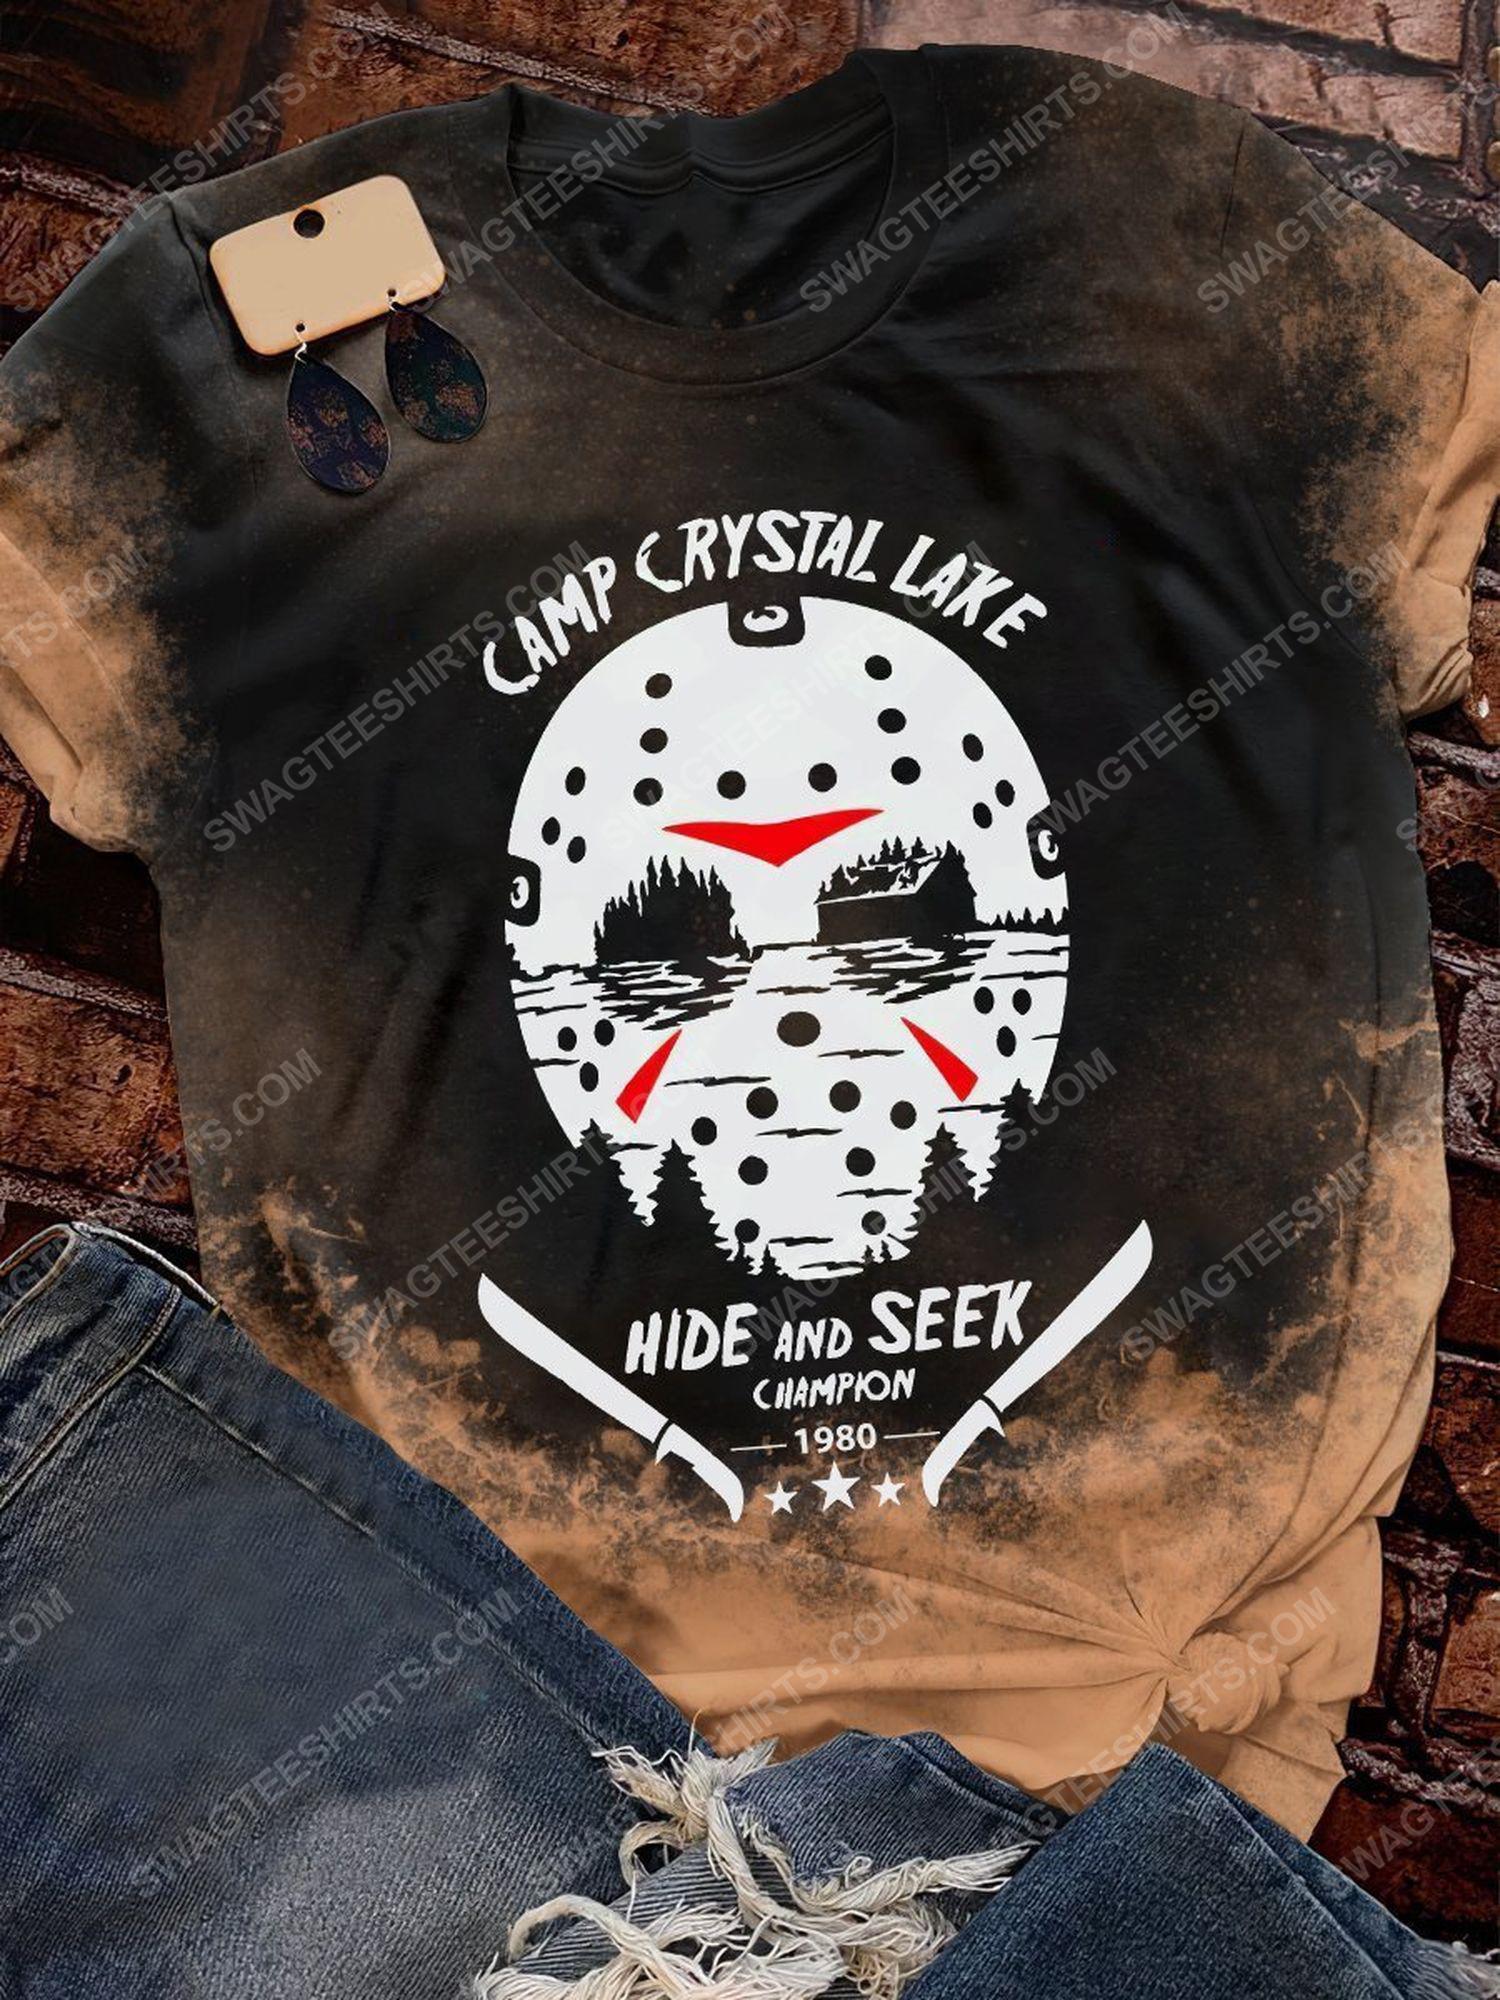 Halloween jason camp crystal lake hide and seek champion shirt 1 - Copy (2)